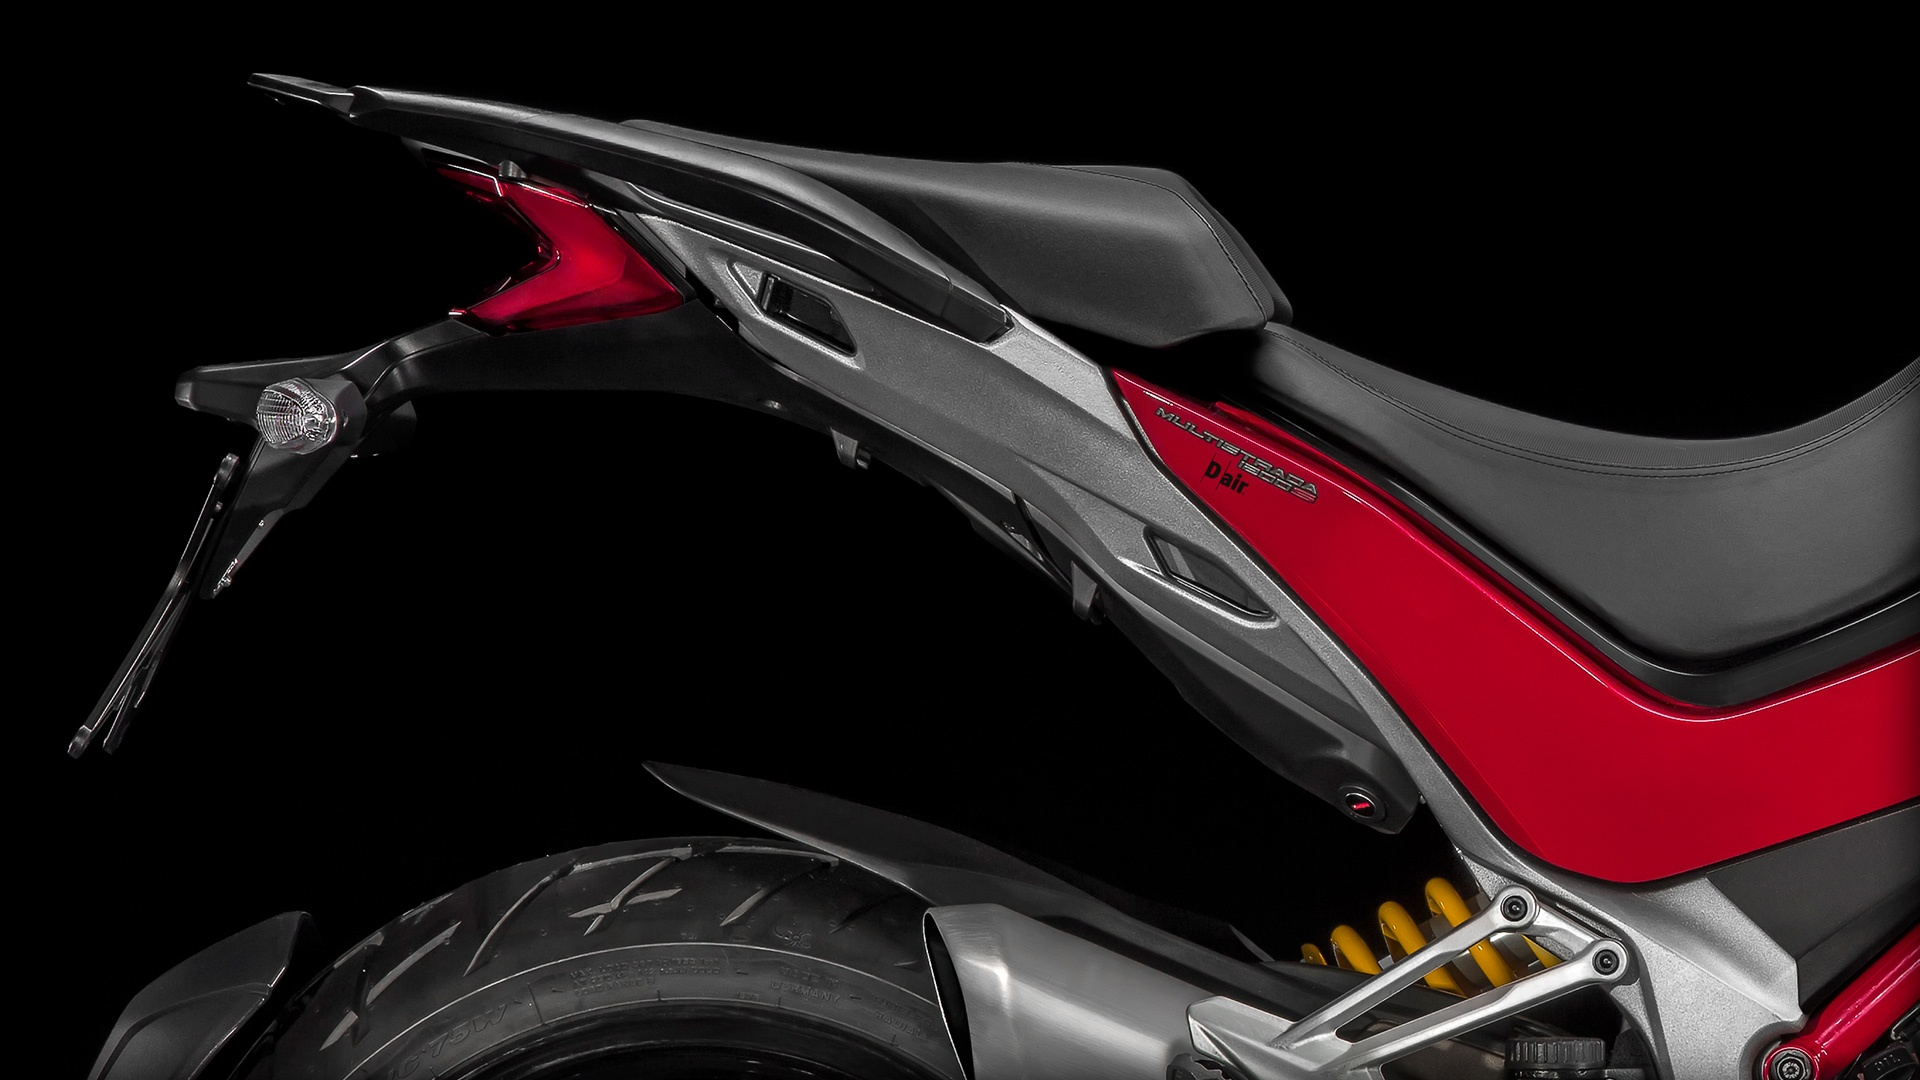 DUCATI MULTISTRADA 1200 S D|AIR ― Артмото - купить квадроцикл в украине и харькове, мотоцикл, снегоход, скутер, мопед, электромобиль